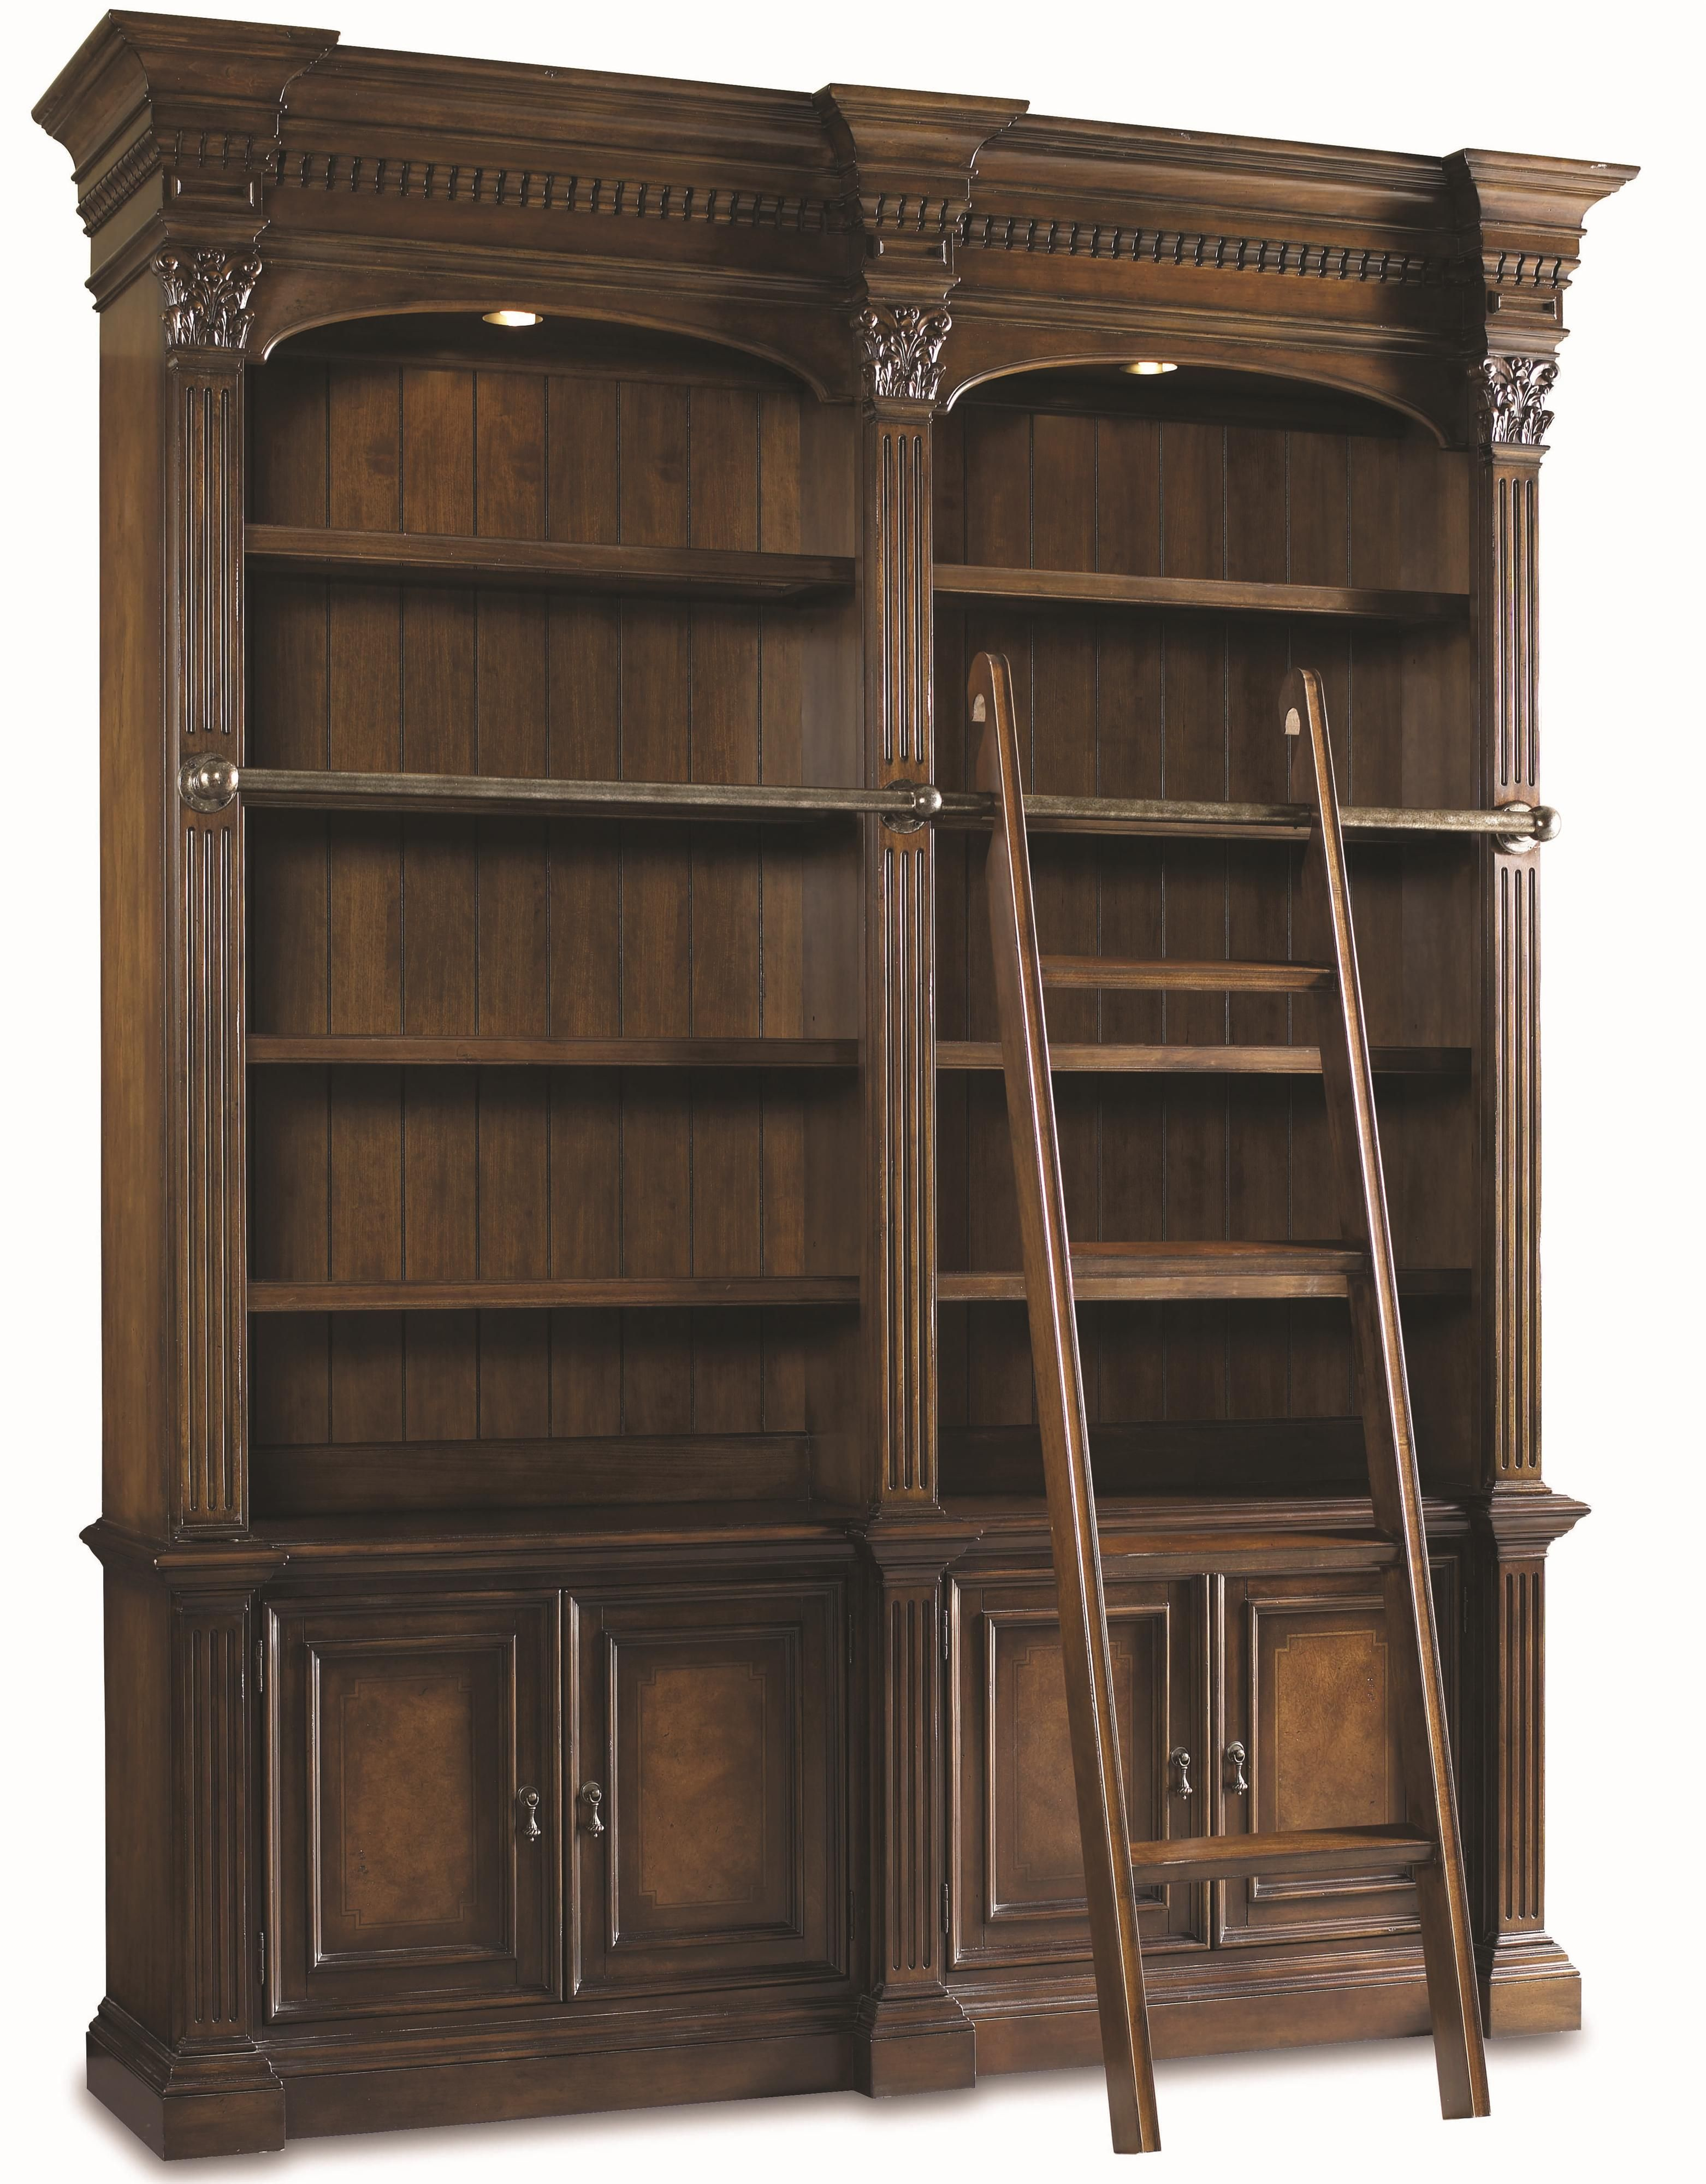 Chateau bookcase walnut leaning bookcase white modern bookcase walnut - Hooker Furniture European Renaissance Ii Double Open Bookshelf W Ladder Ahfa Open Bookcase